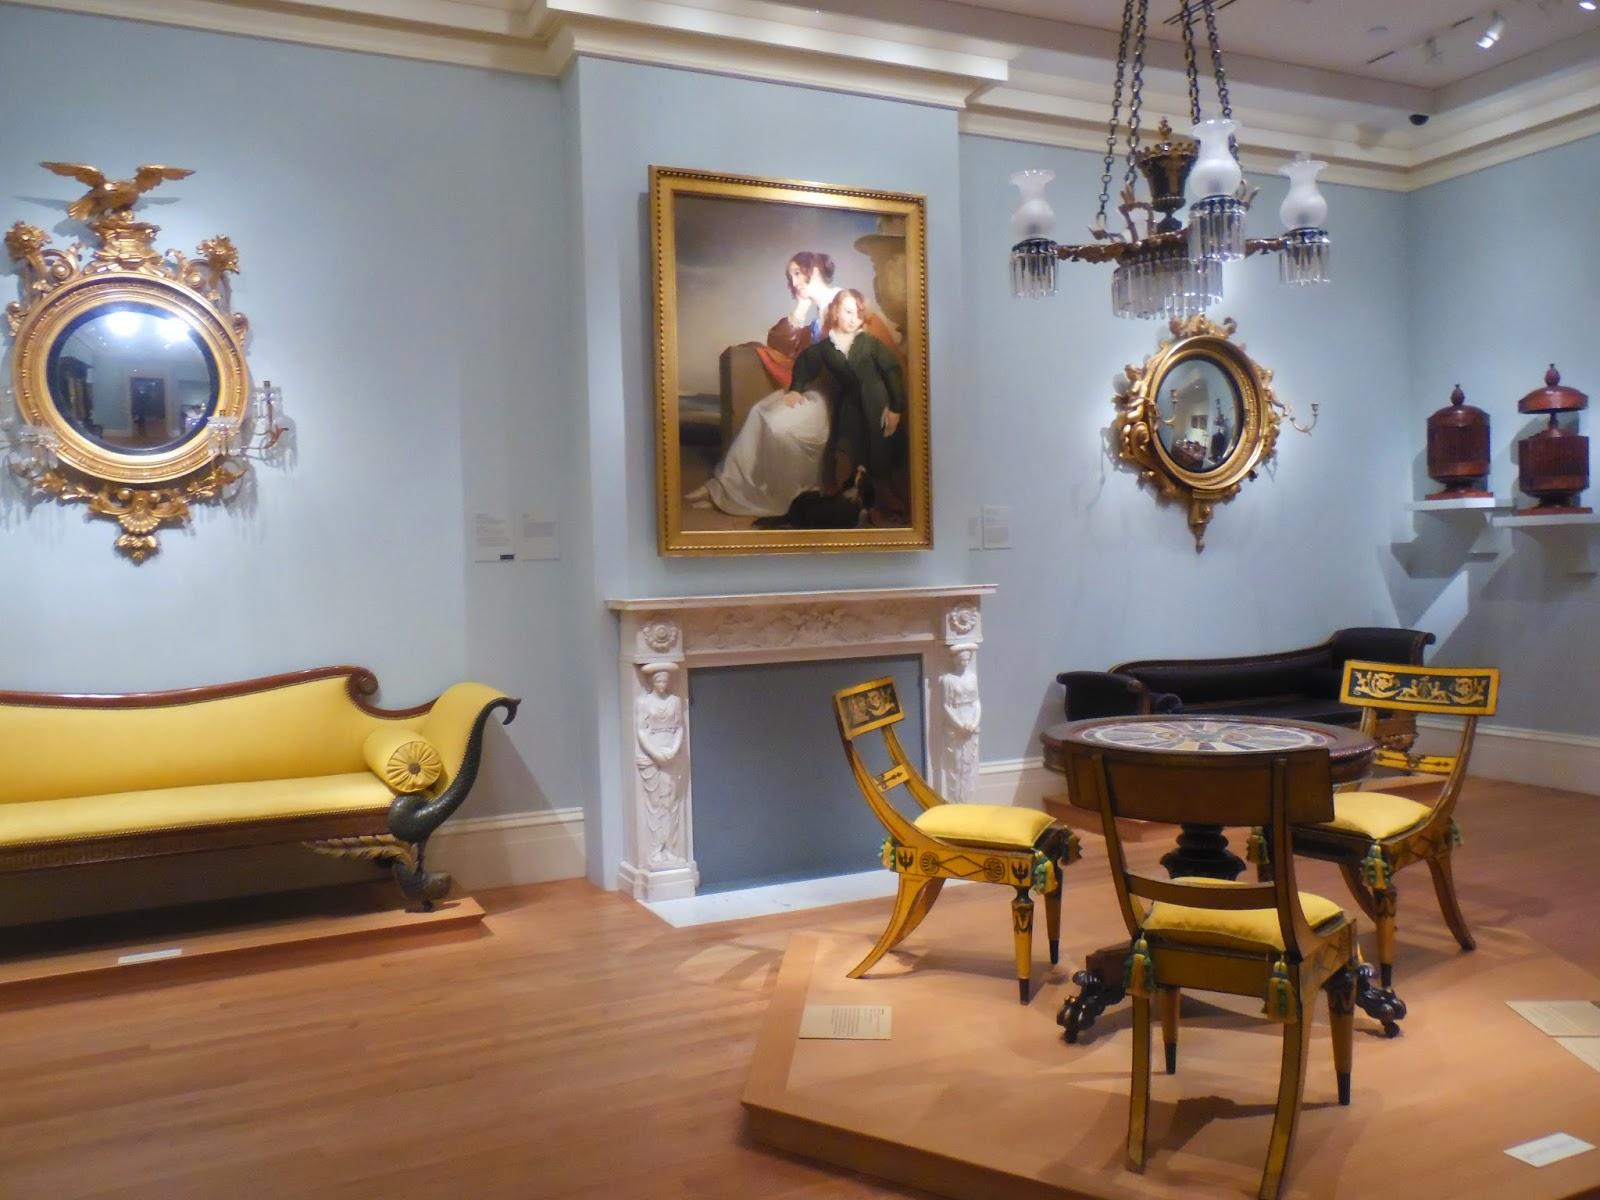 Dise adora de interiores memorias de nueva york iii parte for Disenadora de interiores